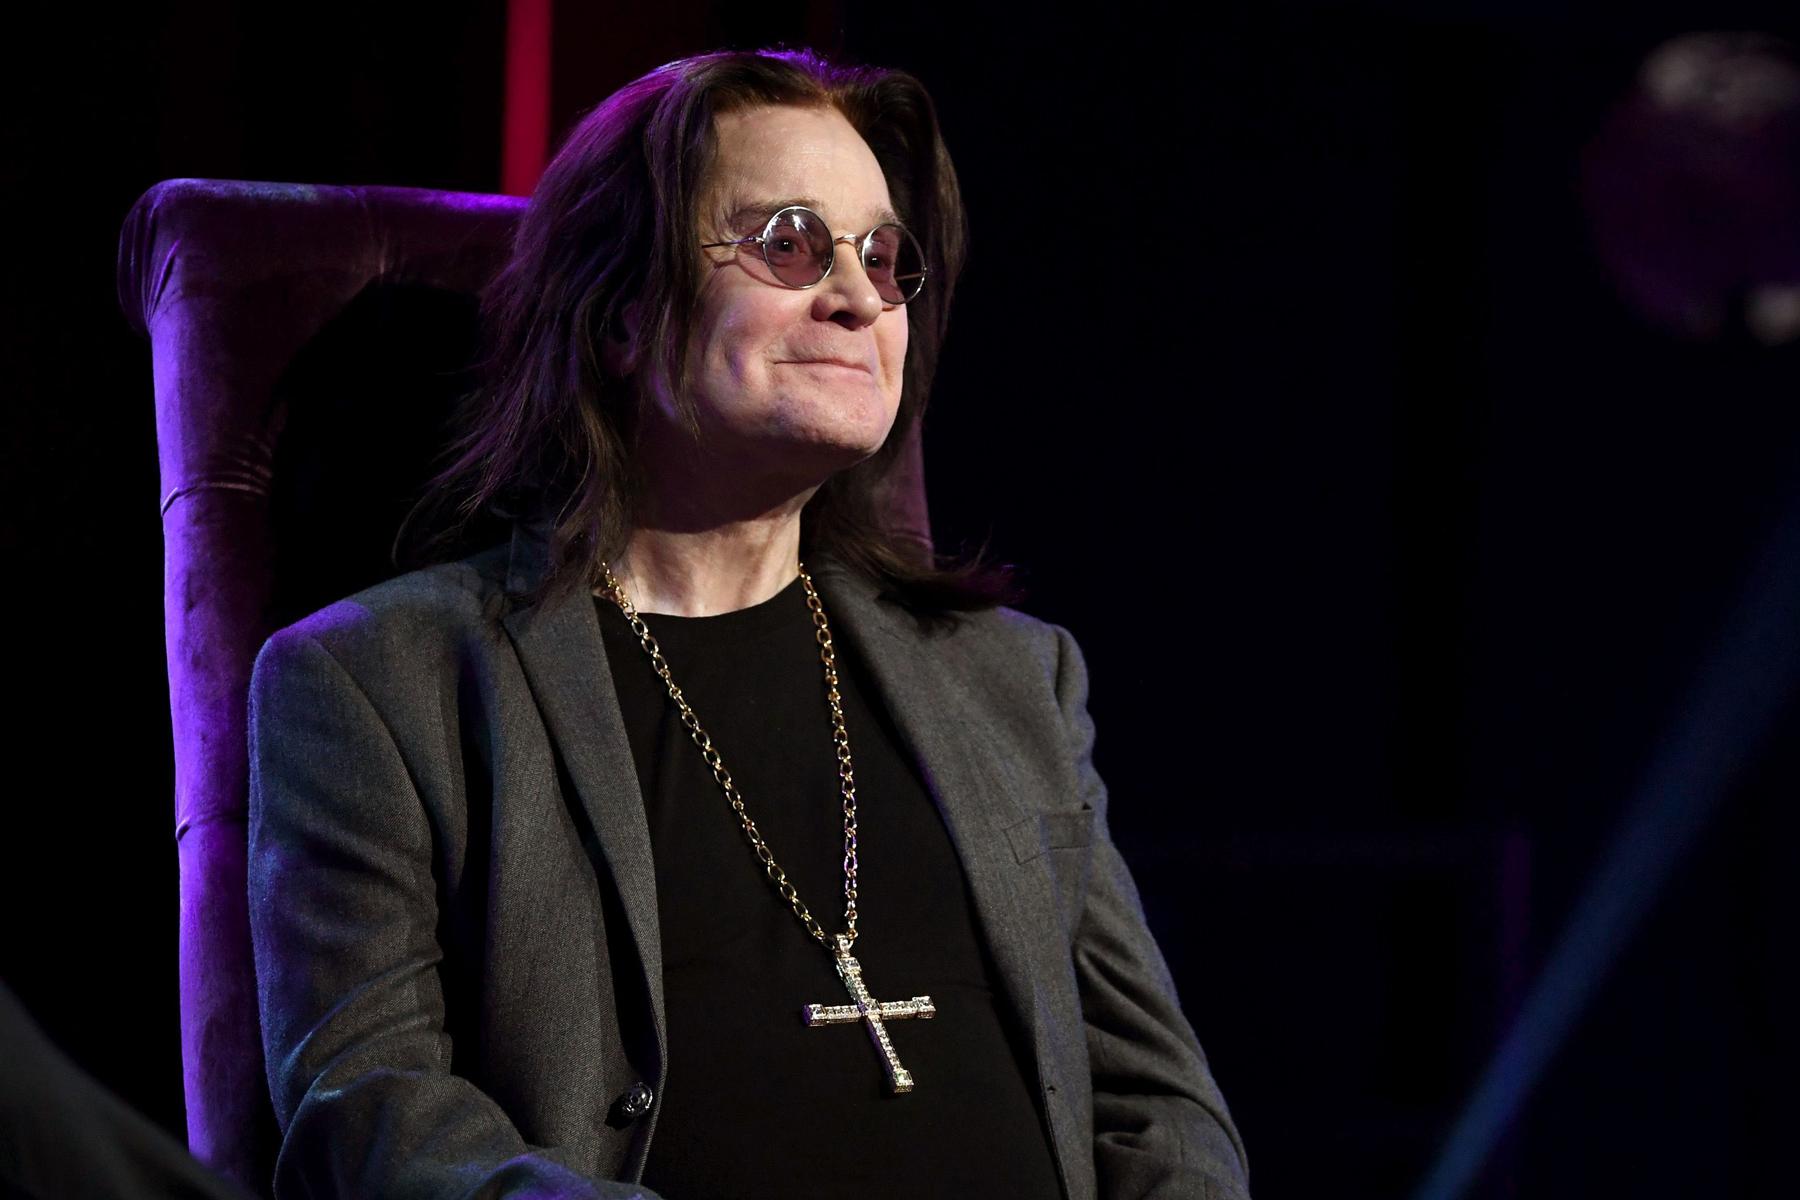 Ozzy Osbourne Already Working on 'Ordinary Man' Follow-Up